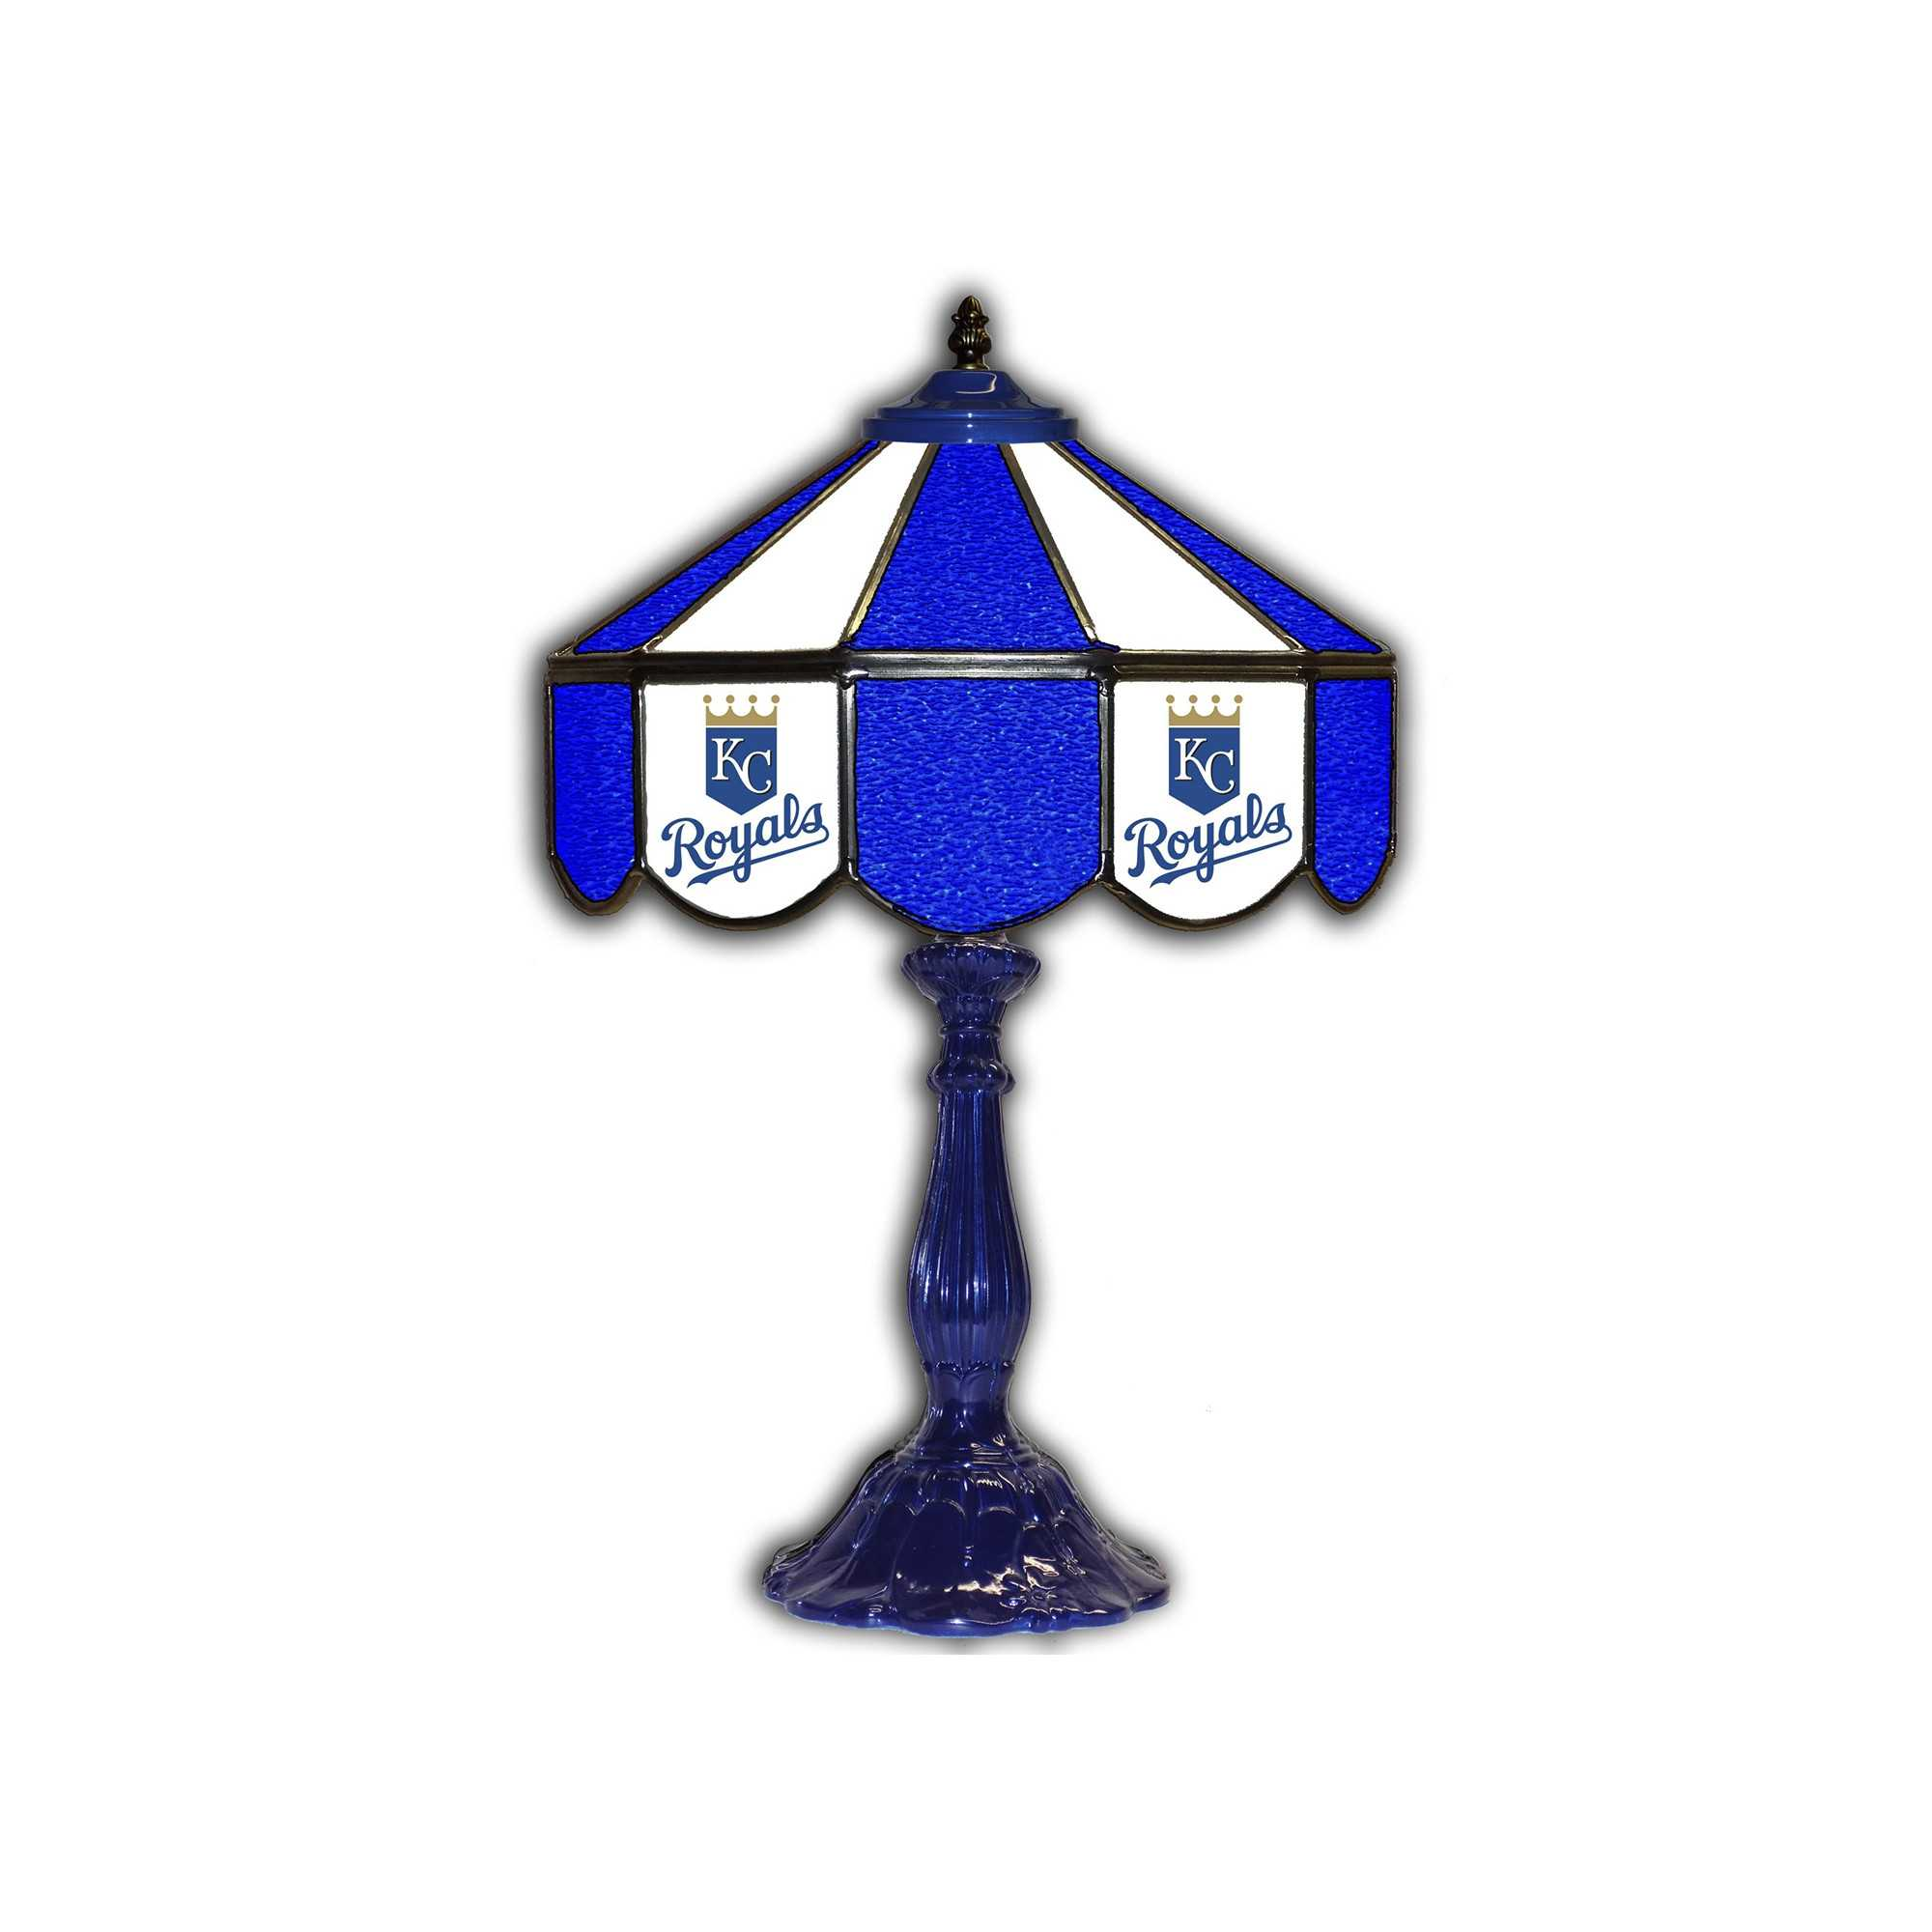 "KANSAS CITY ROYALS 21"" GLASS TABLE LAMP"